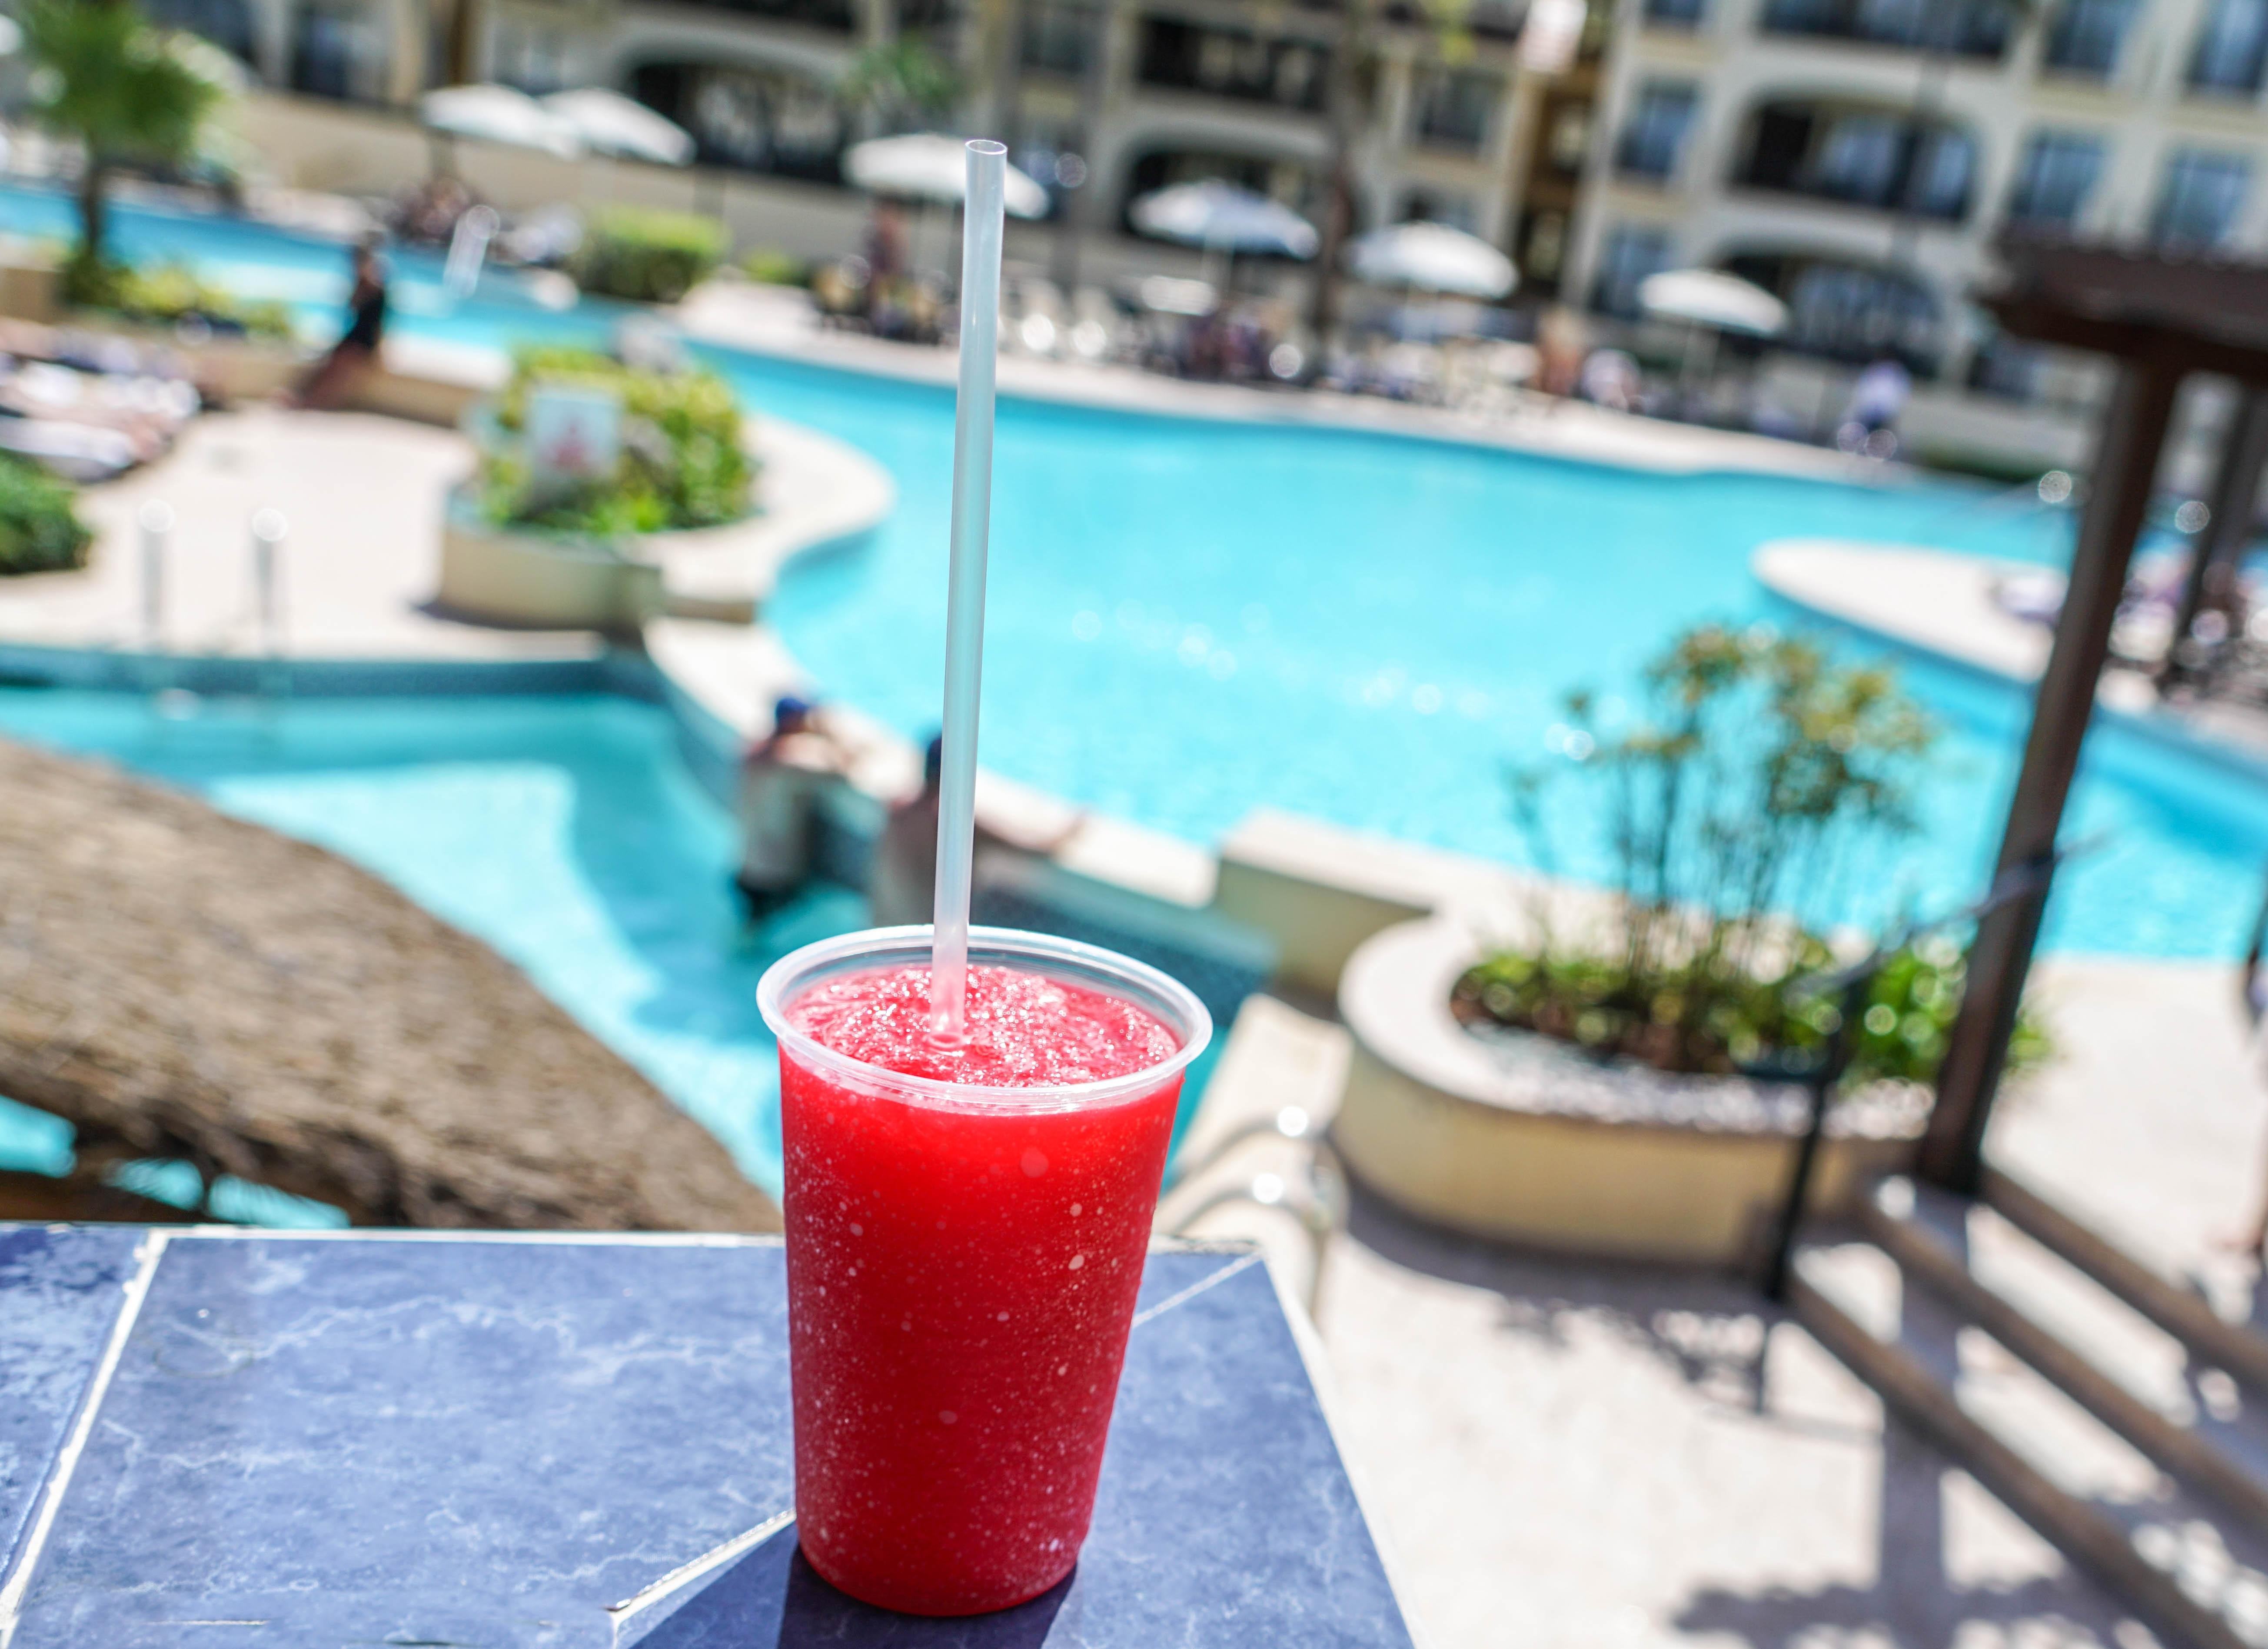 cool summer meal slushy help beat heat